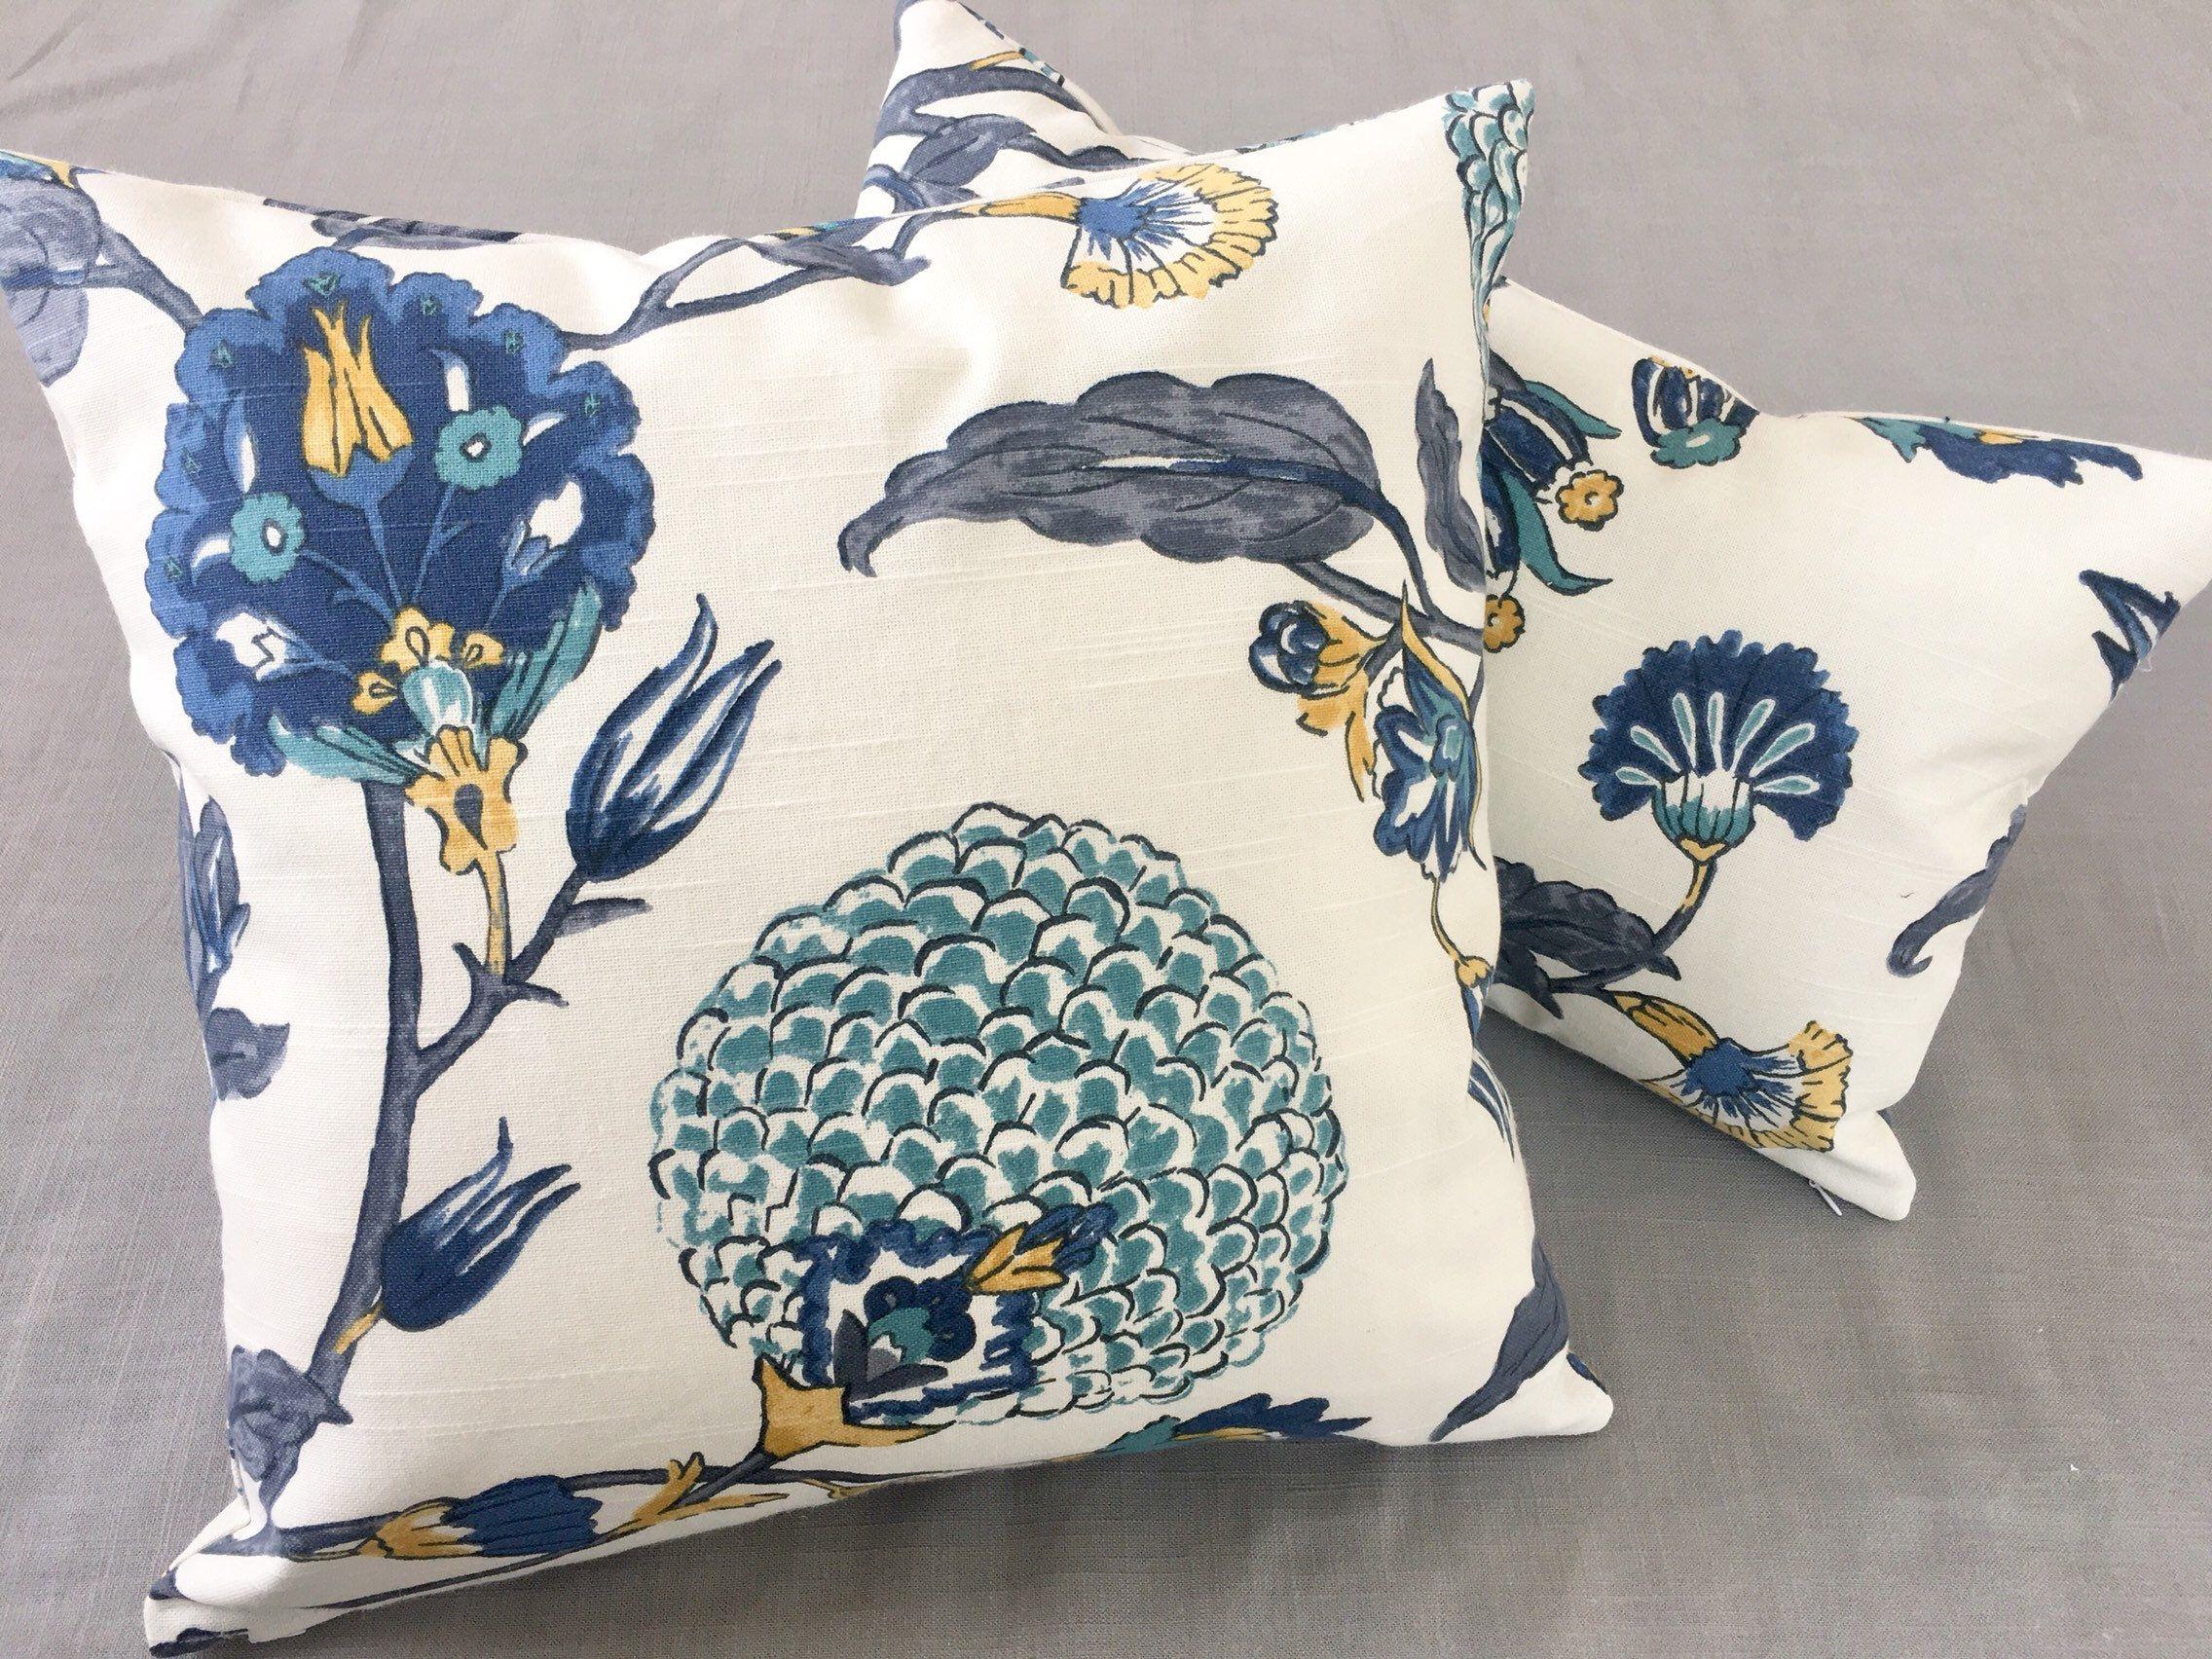 Blue Floral Accent Pillows Blue Accent Pillows Floral Pillow Blue Floral Pillow Etsy Blueflor Floral Accent Pillow Blue Throw Pillow Cover Blue Accent Pillow